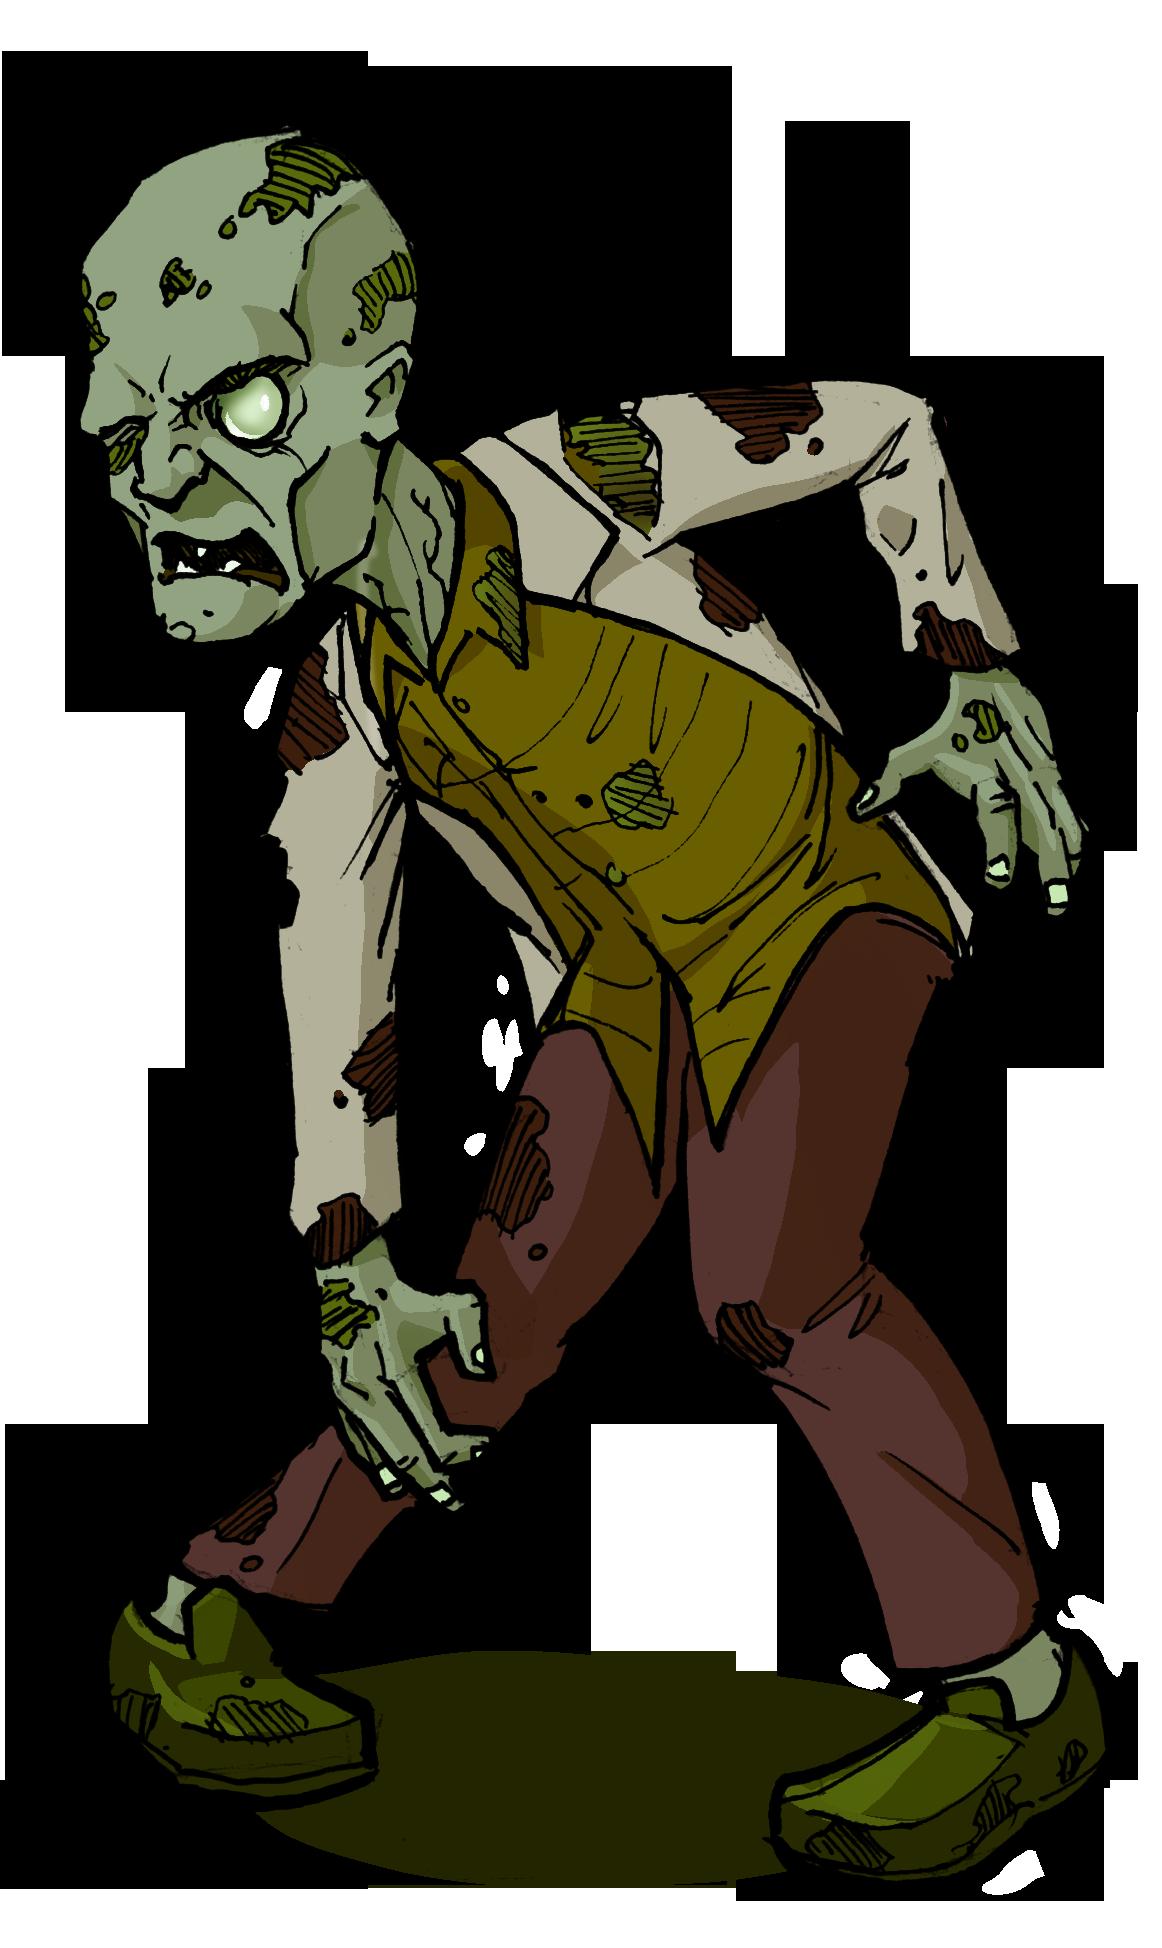 Zombie Concept Design